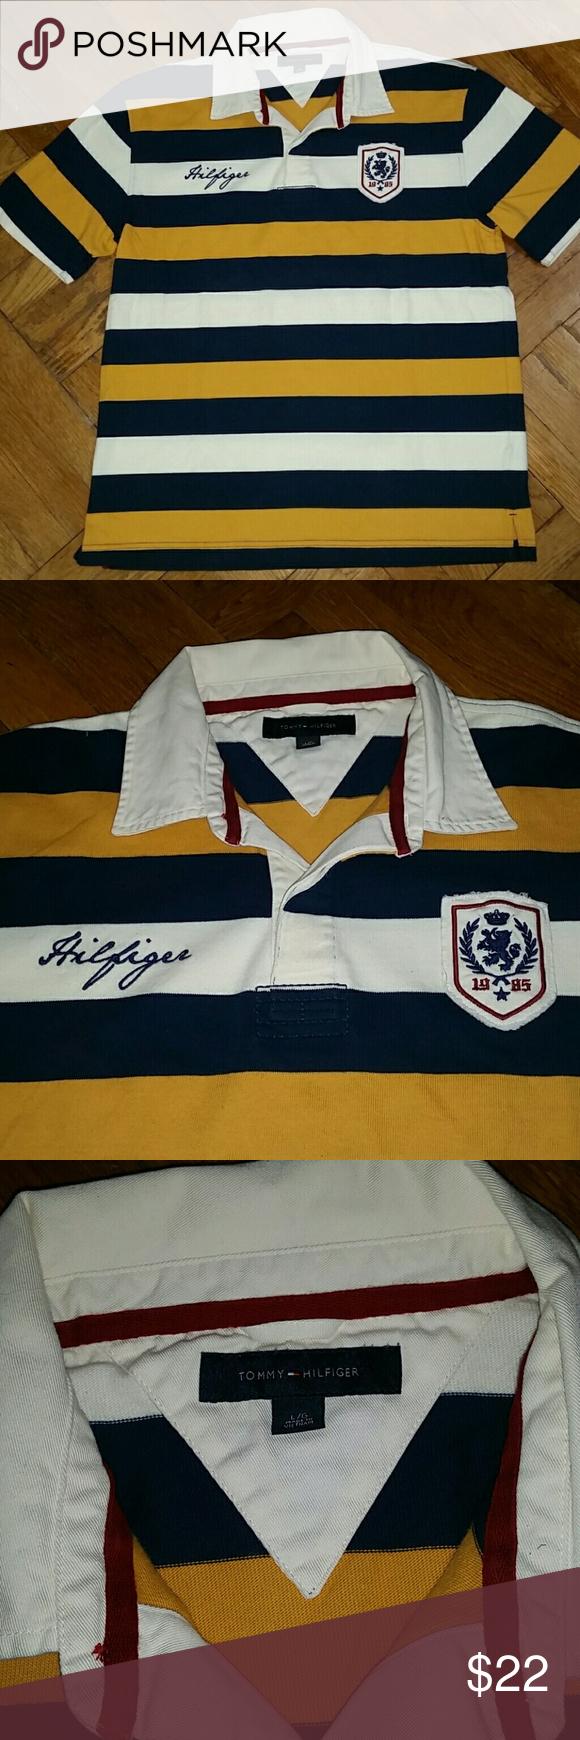 Vintage Tommy Hilfiger Polo Vintage Tommy Hilfiger Polo Size Large. Tommy Hilfiger Shirts